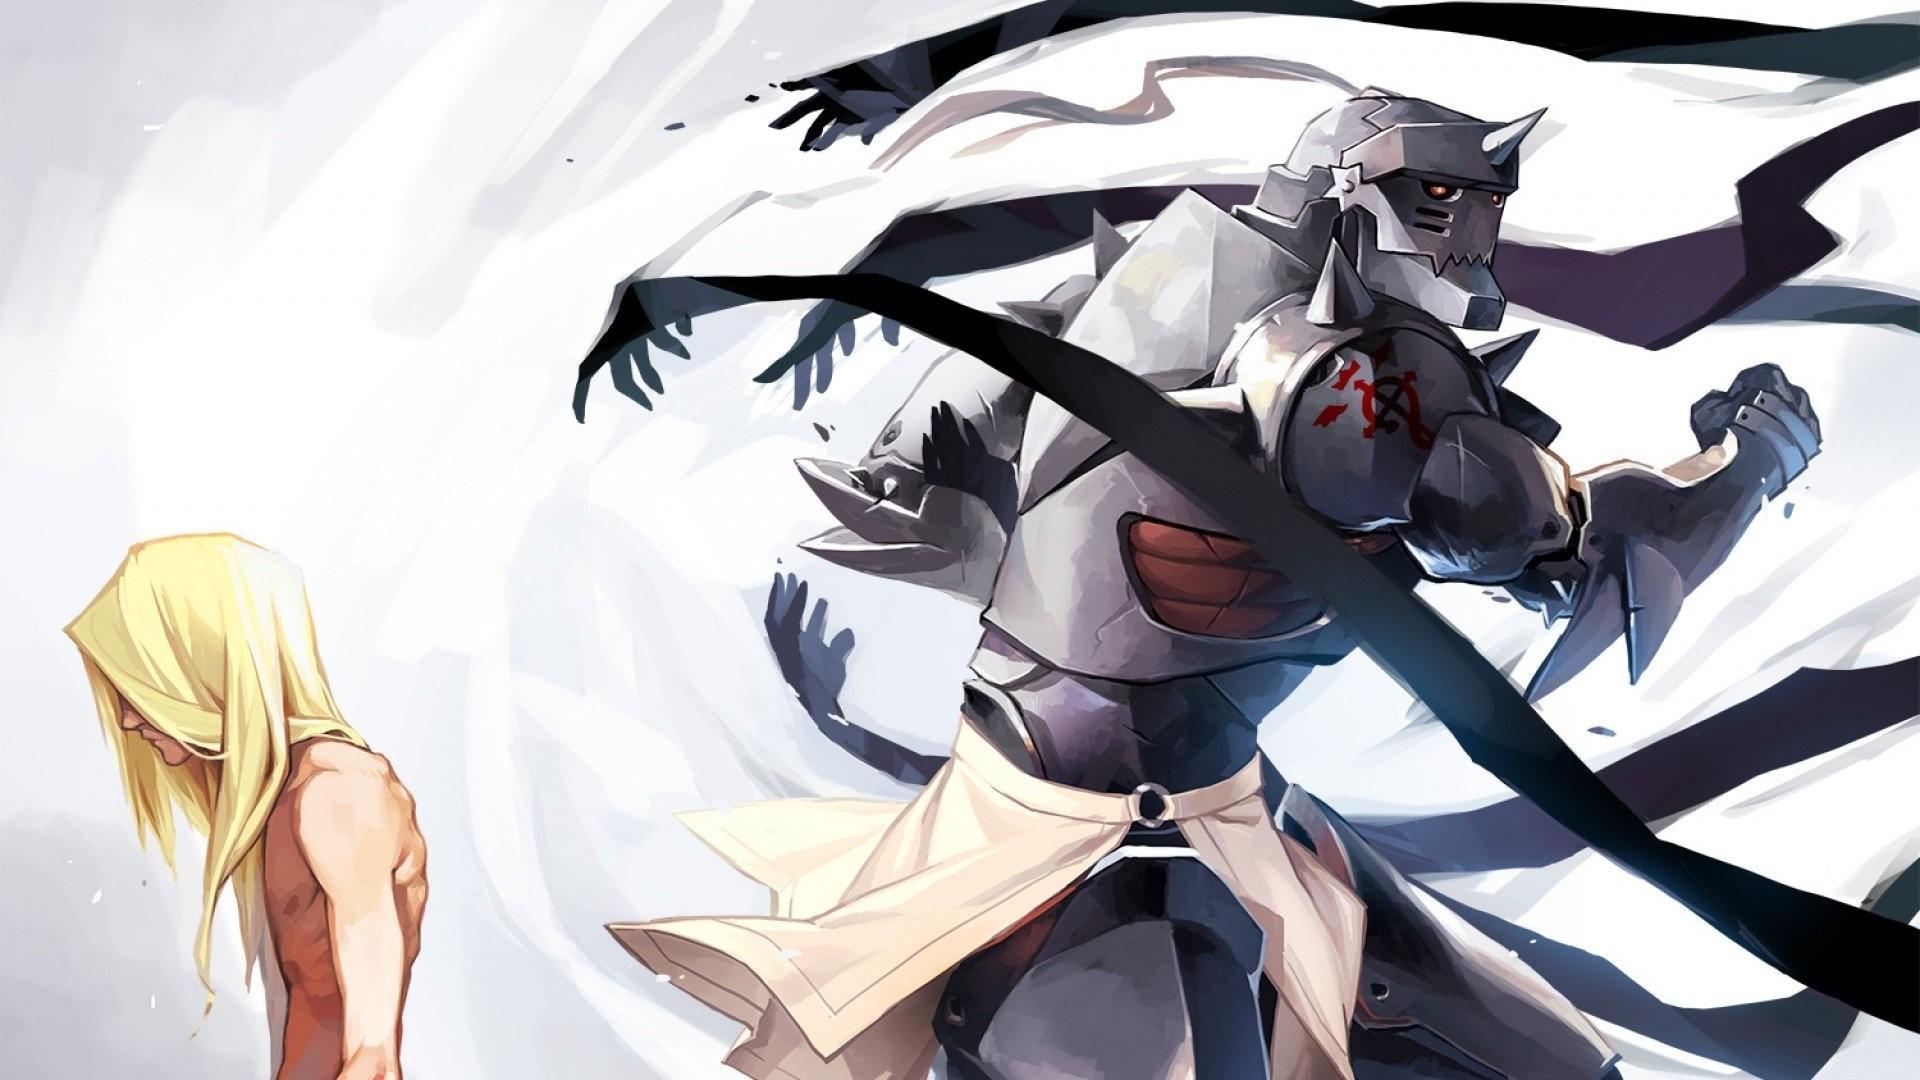 Res: 1920x1080, anime fullmetal alchemist elric alphonse